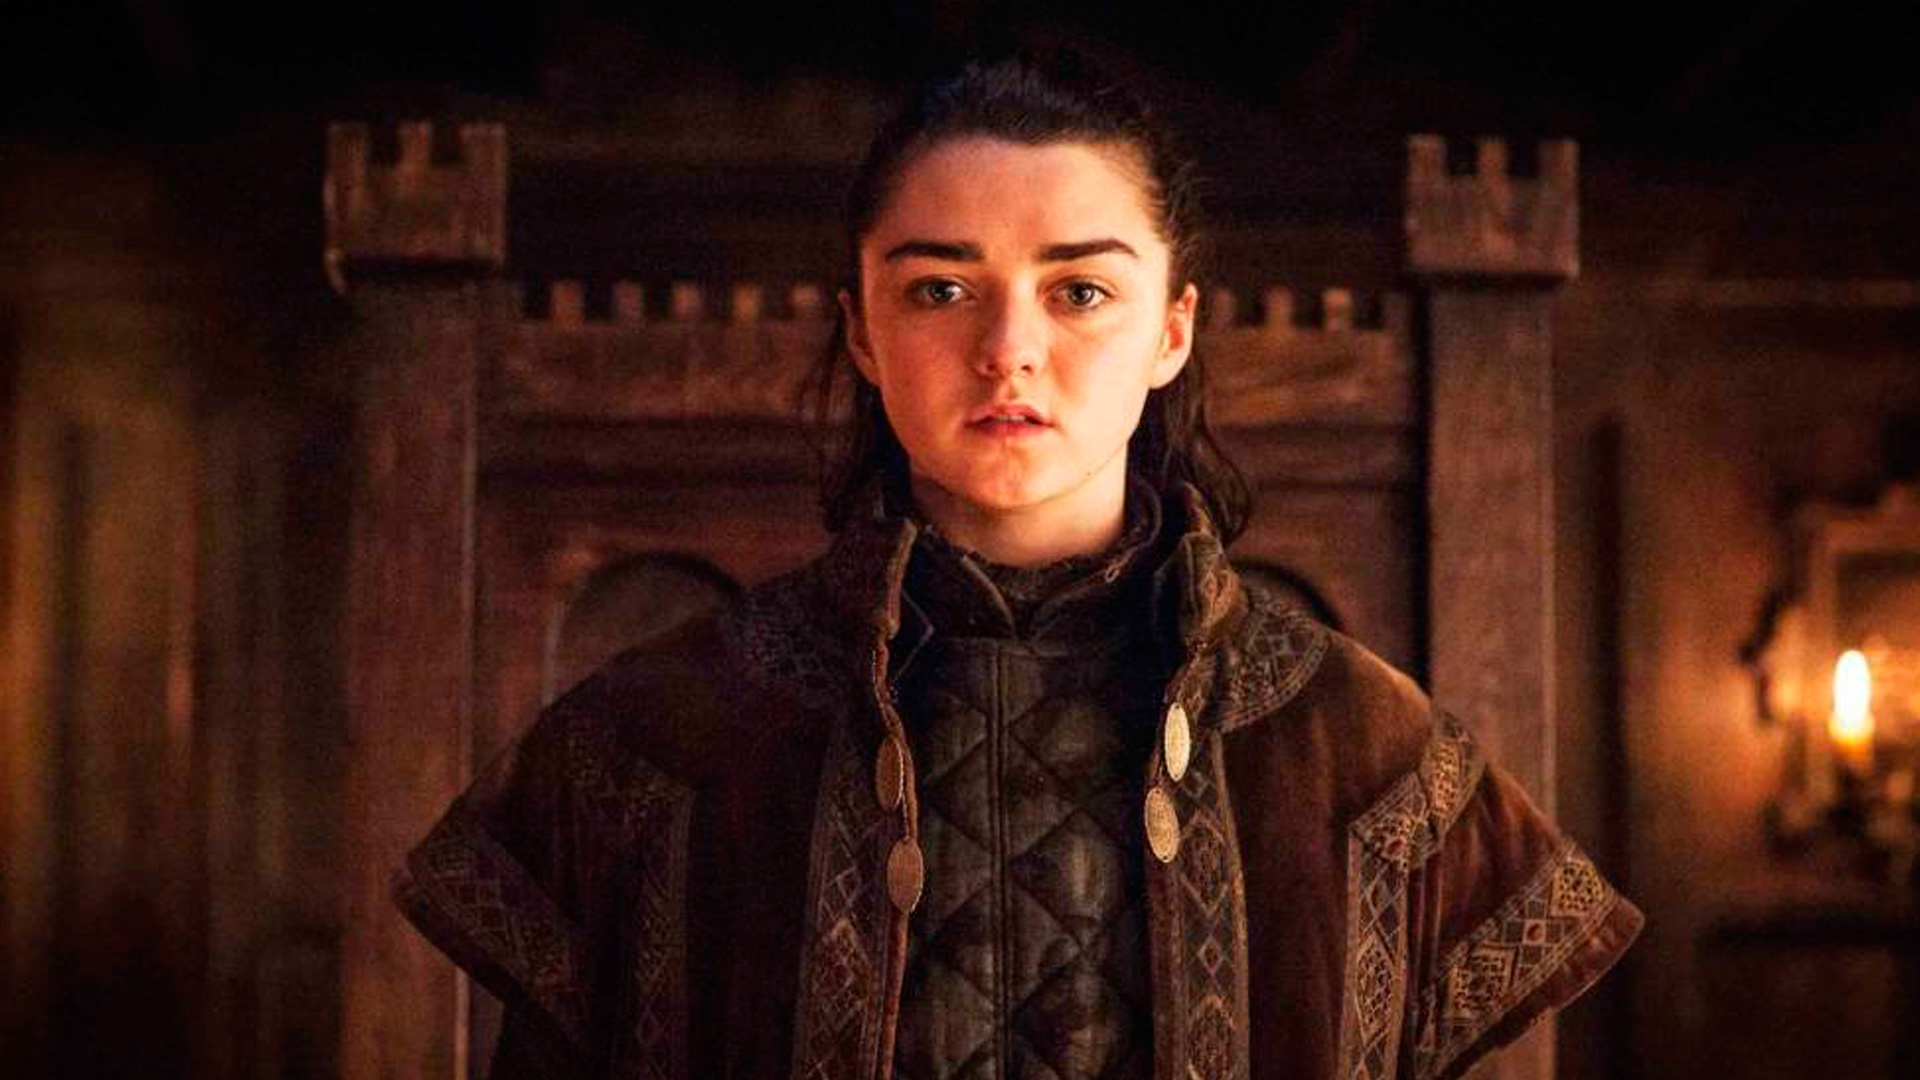 Arya Stark (HBO)